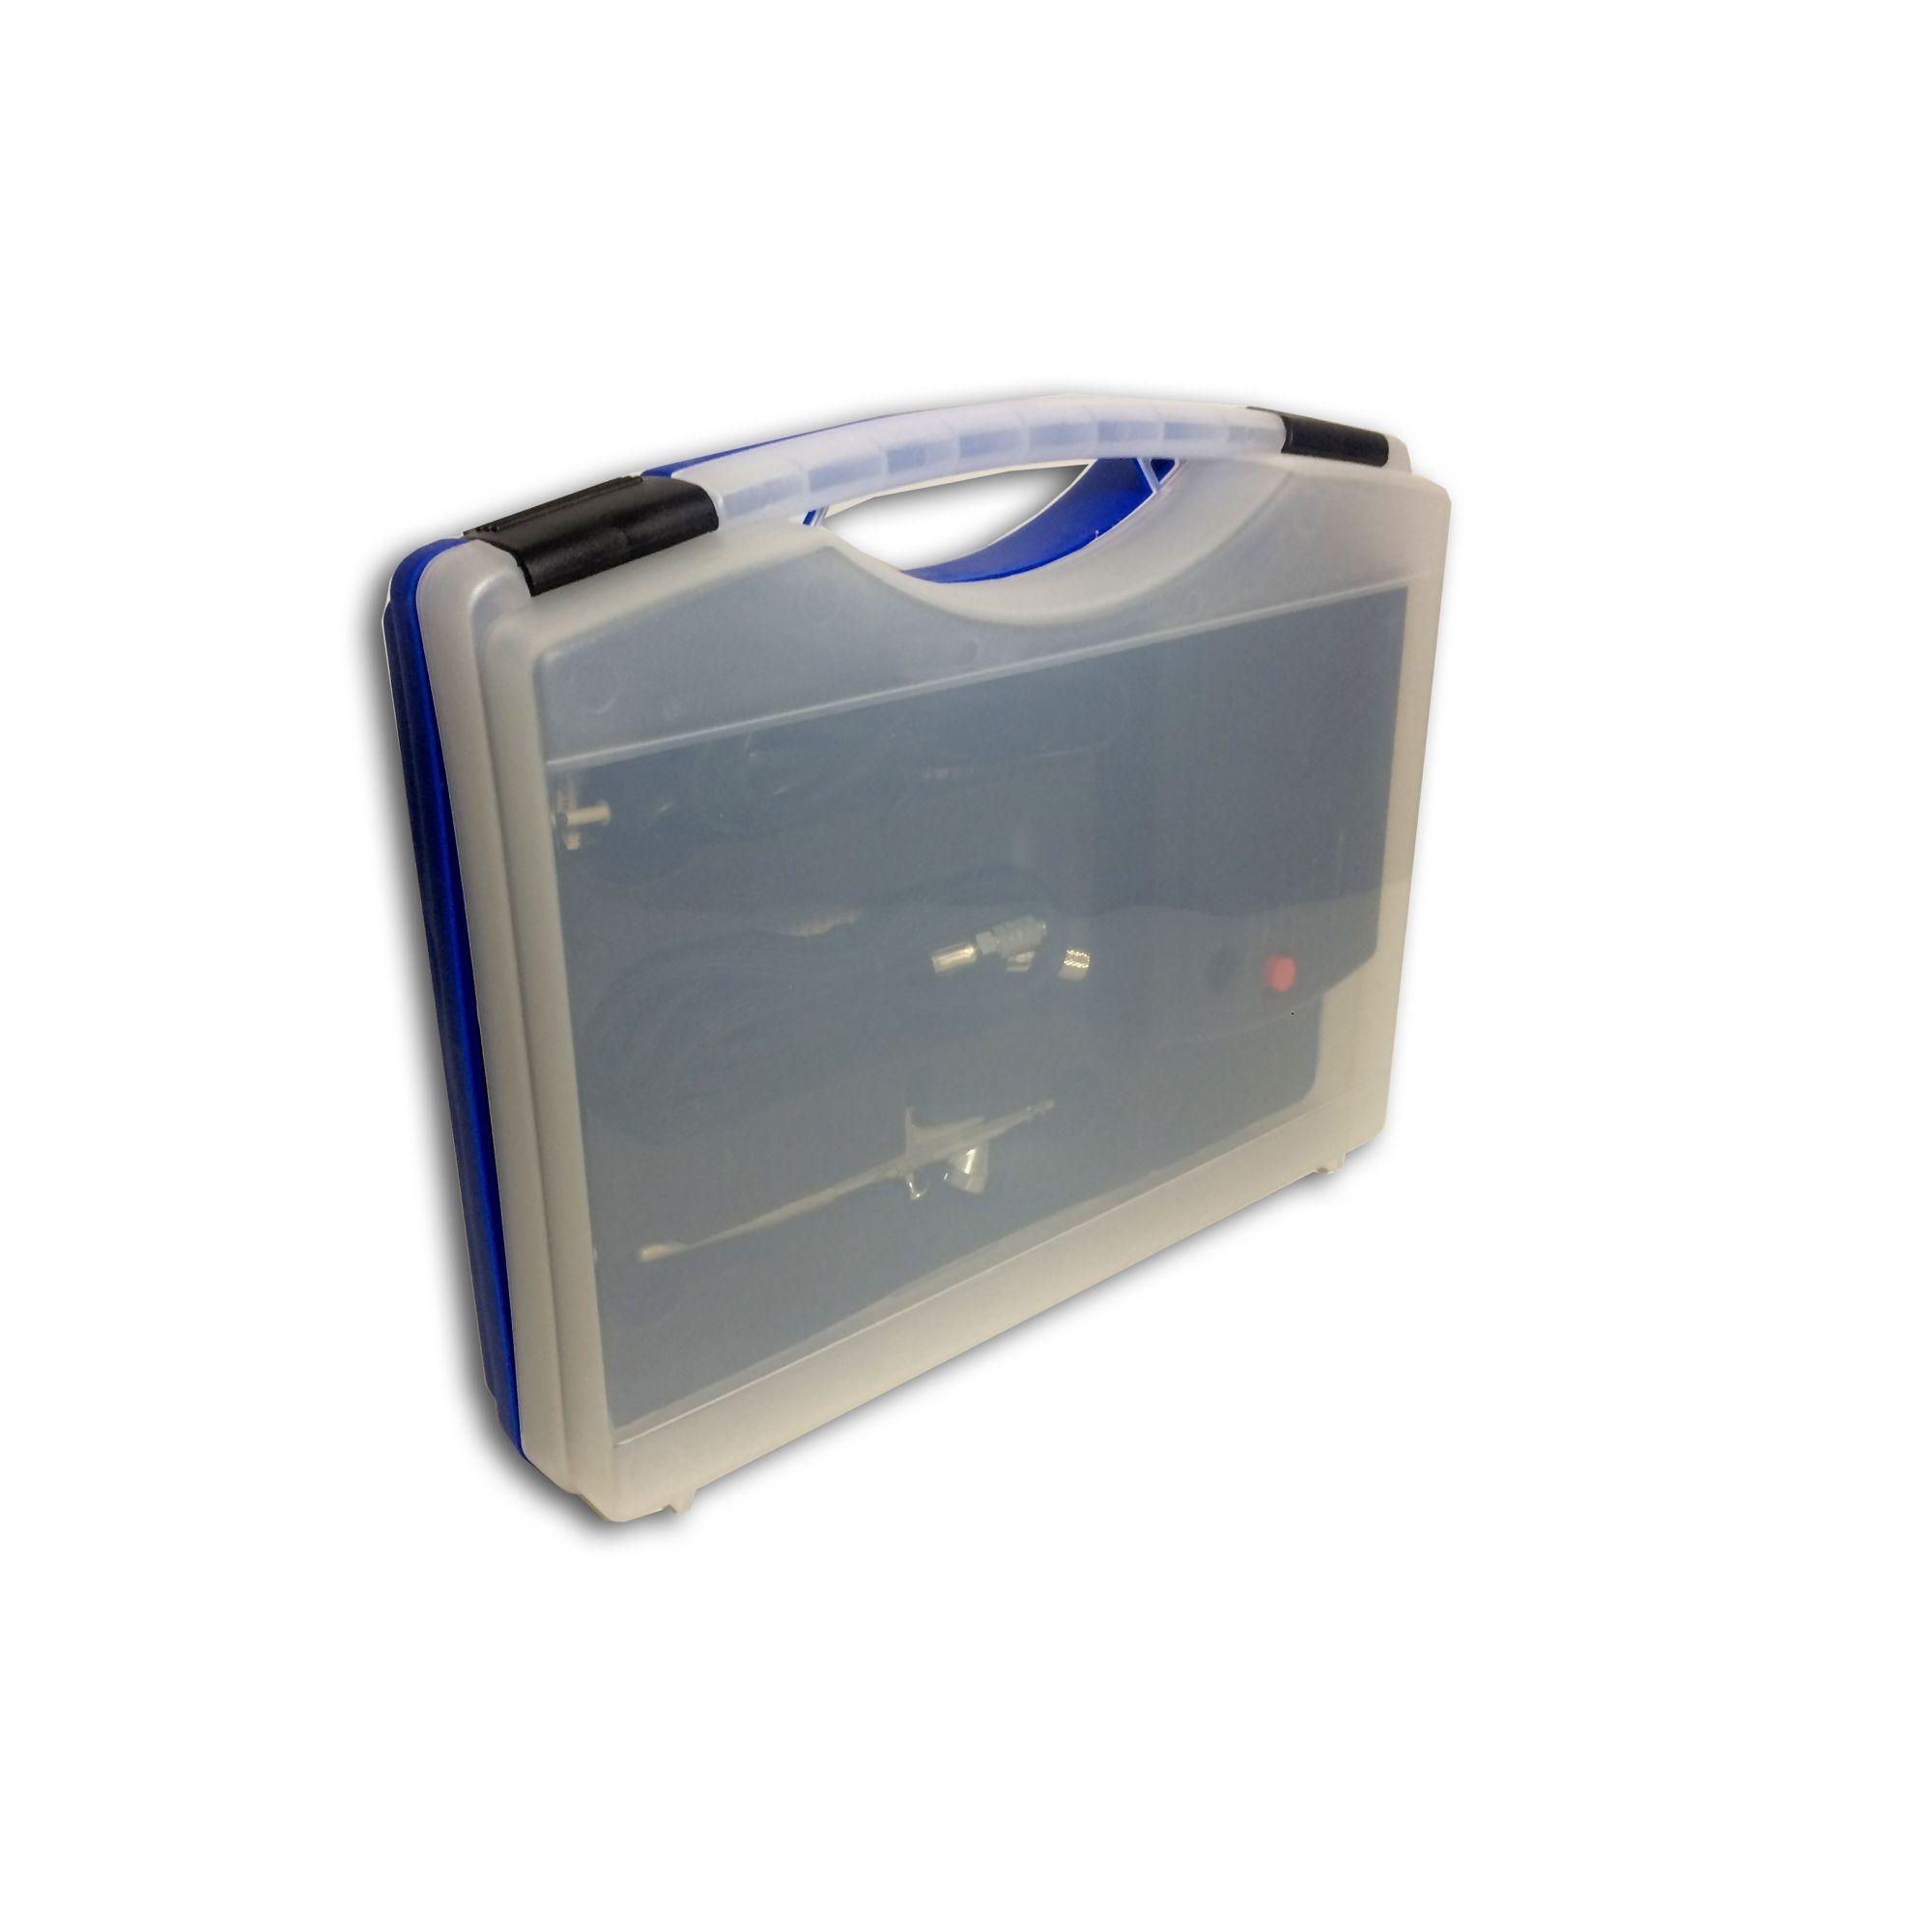 Estojo Pro - Aerógrafo Mangueira E Compressor Para Pinturas  - Loja Silver Box